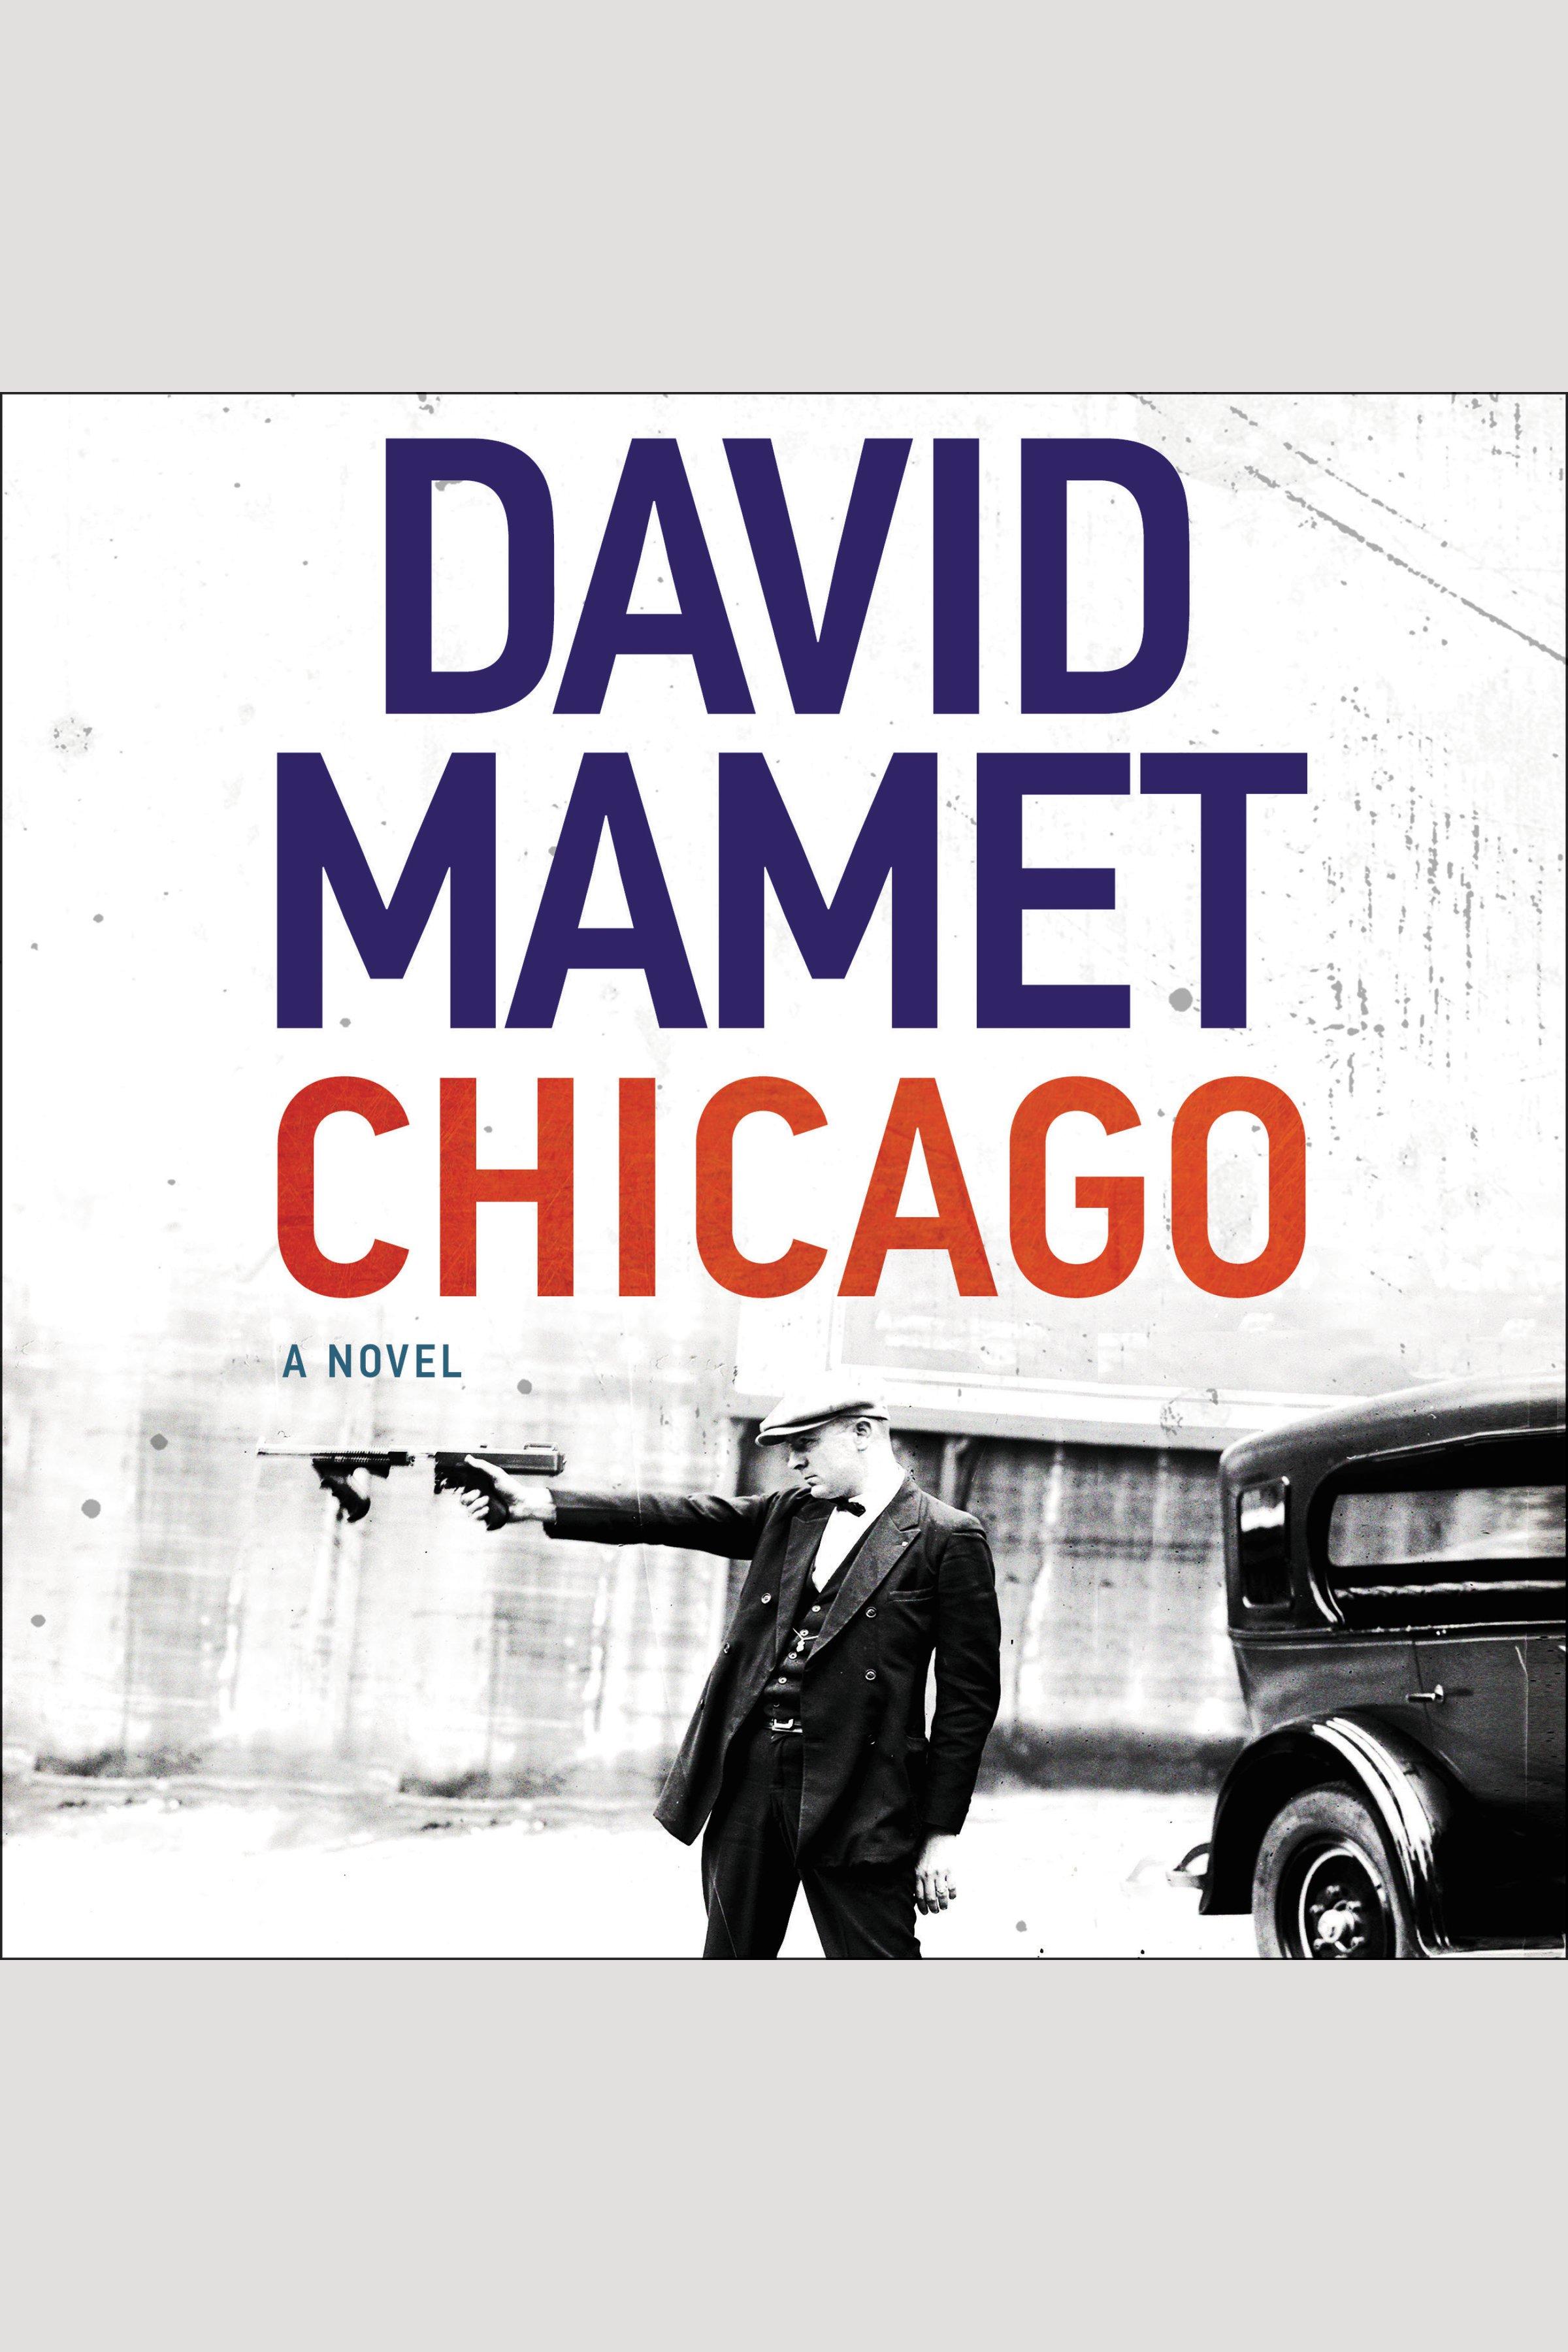 Chicago [AudioEbook] : a novel